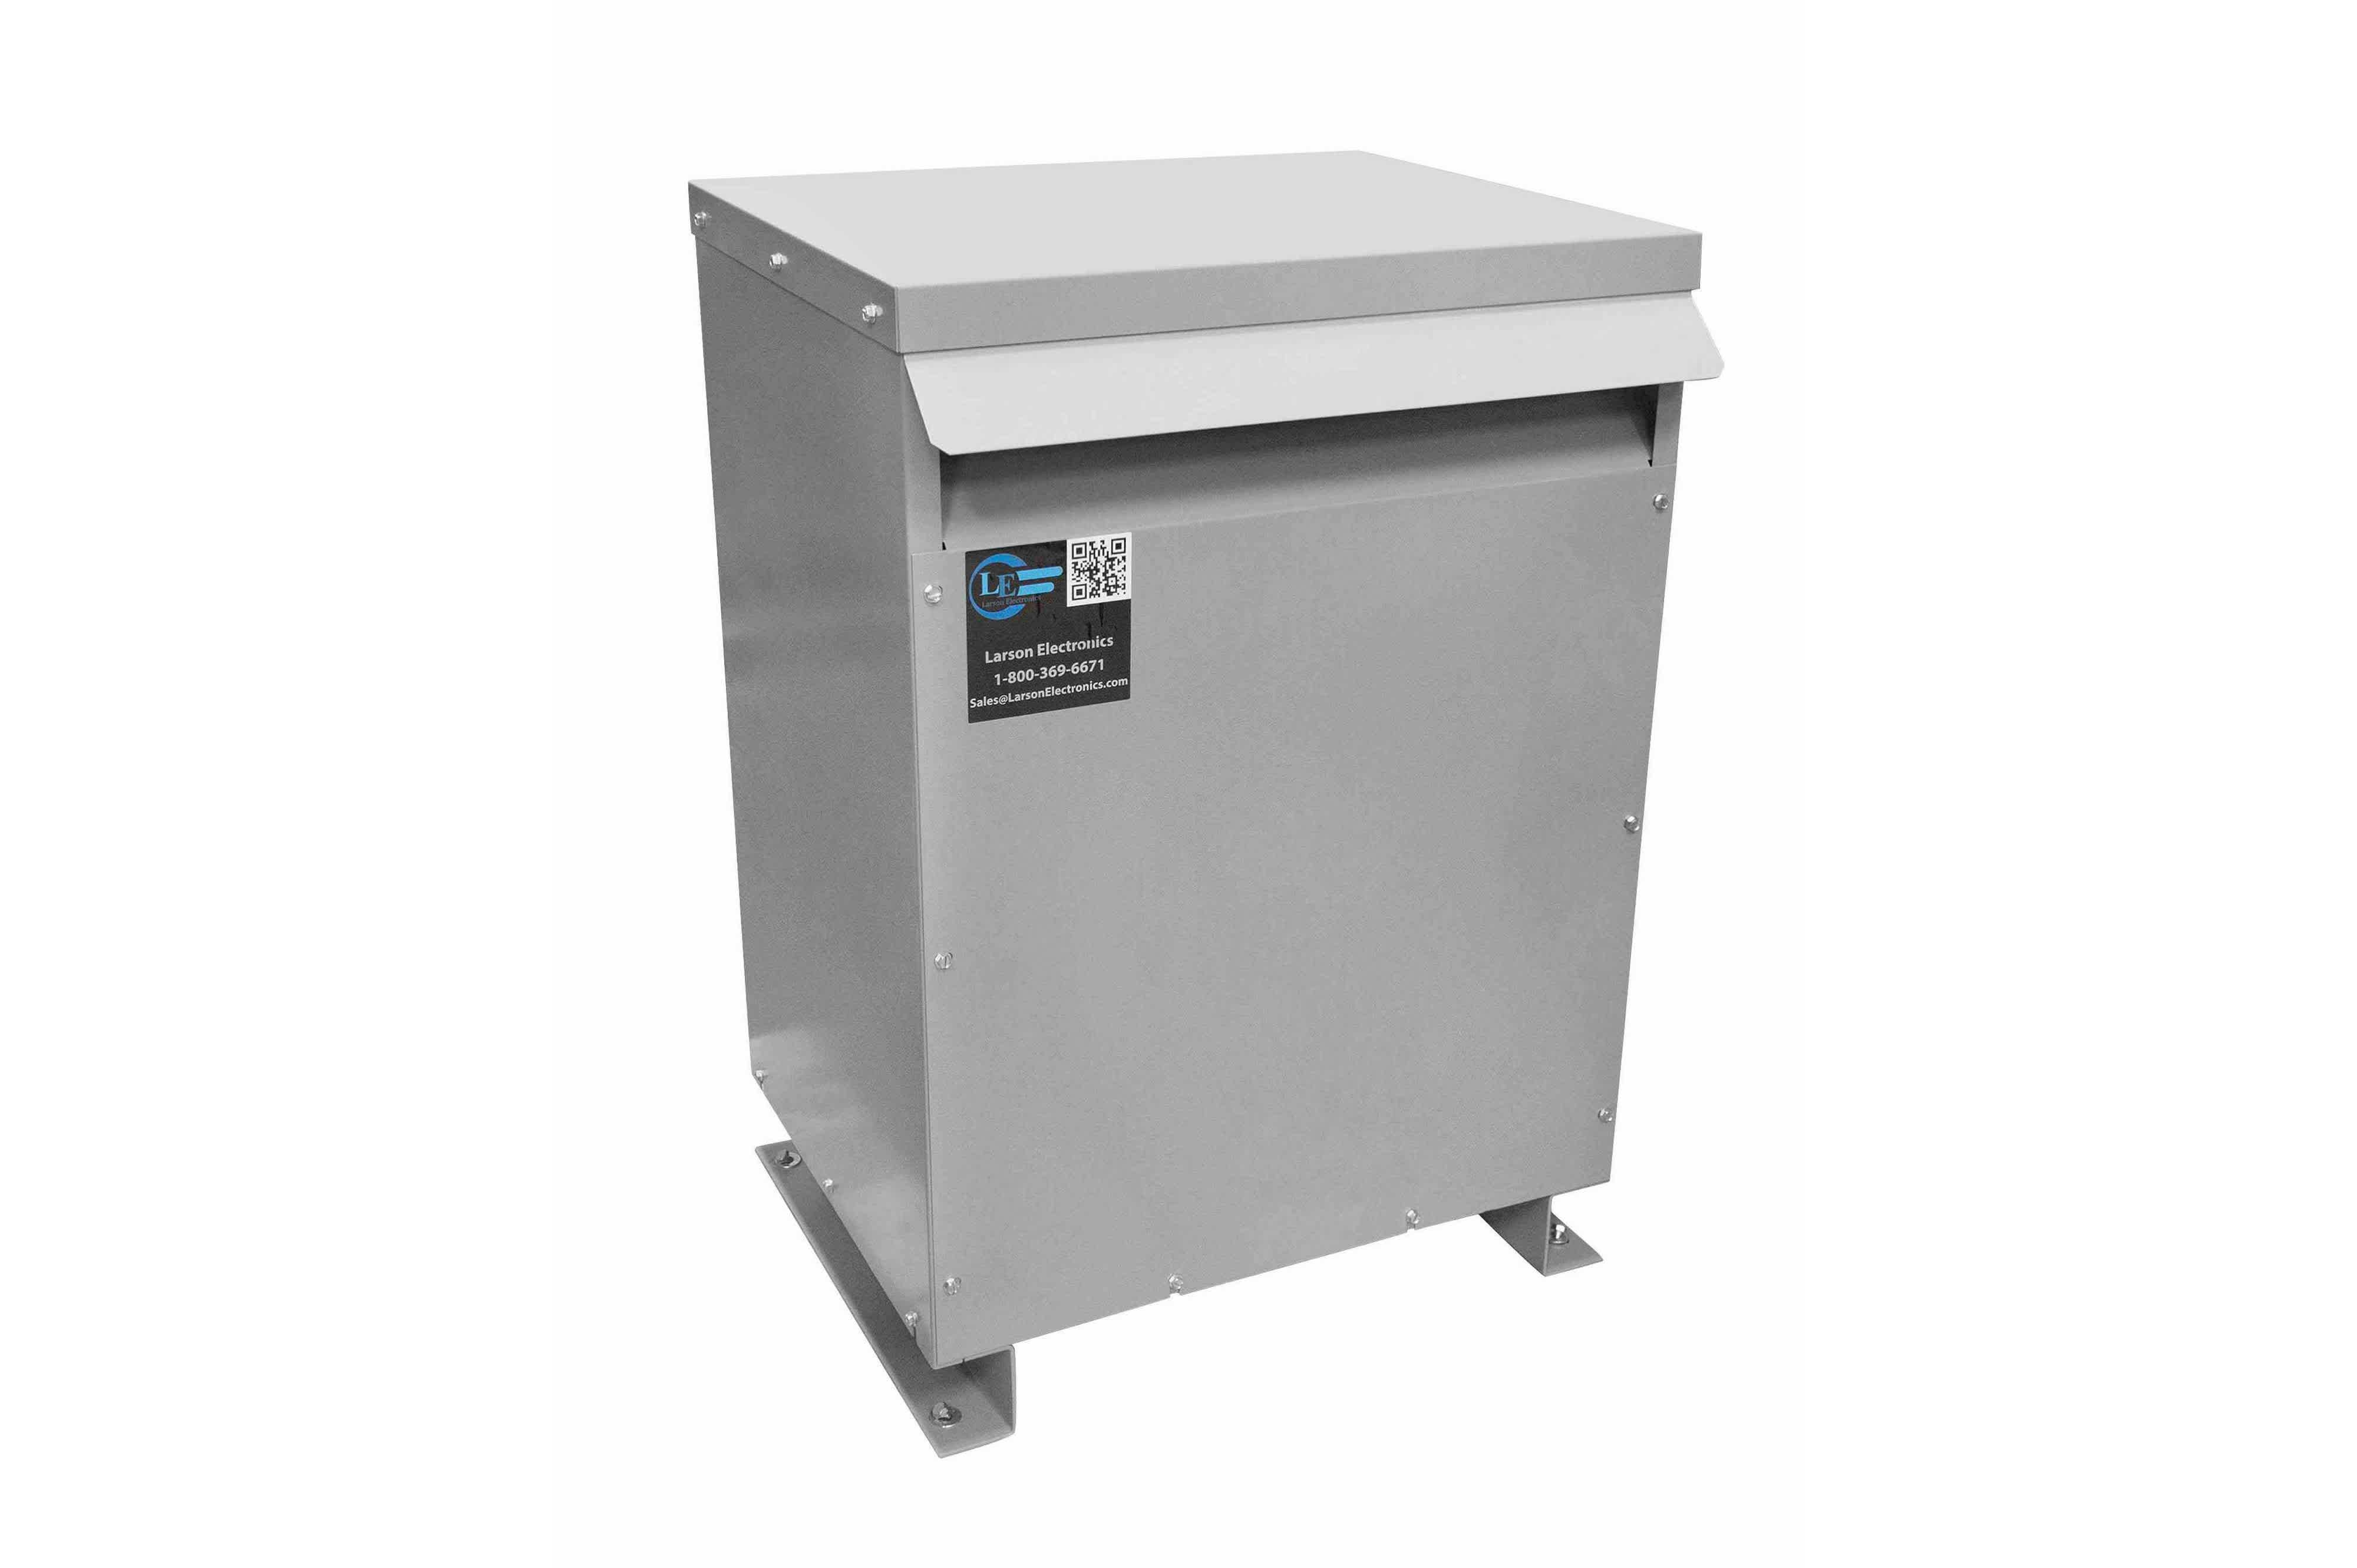 800 kVA 3PH Isolation Transformer, 575V Wye Primary, 380V Delta Secondary, N3R, Ventilated, 60 Hz